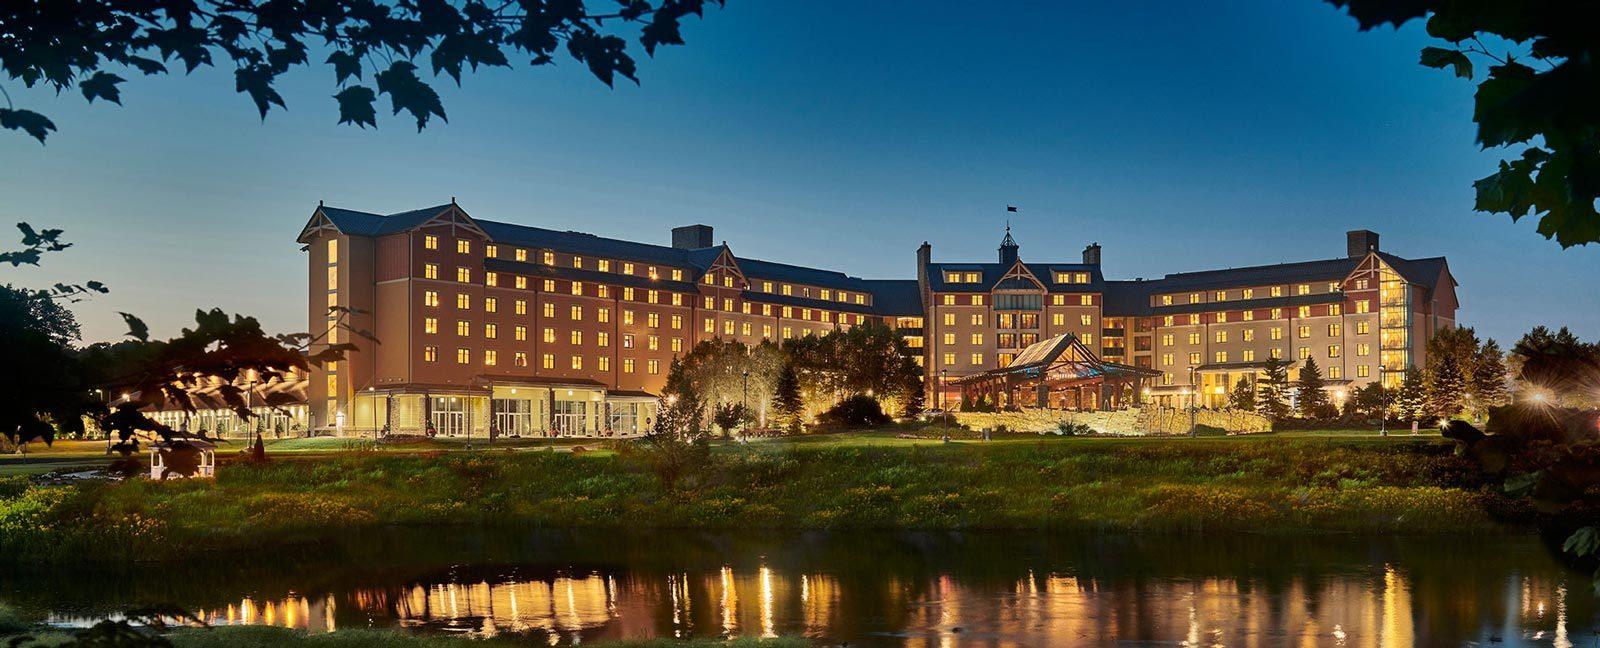 mt airy casino resort spa building nighttime